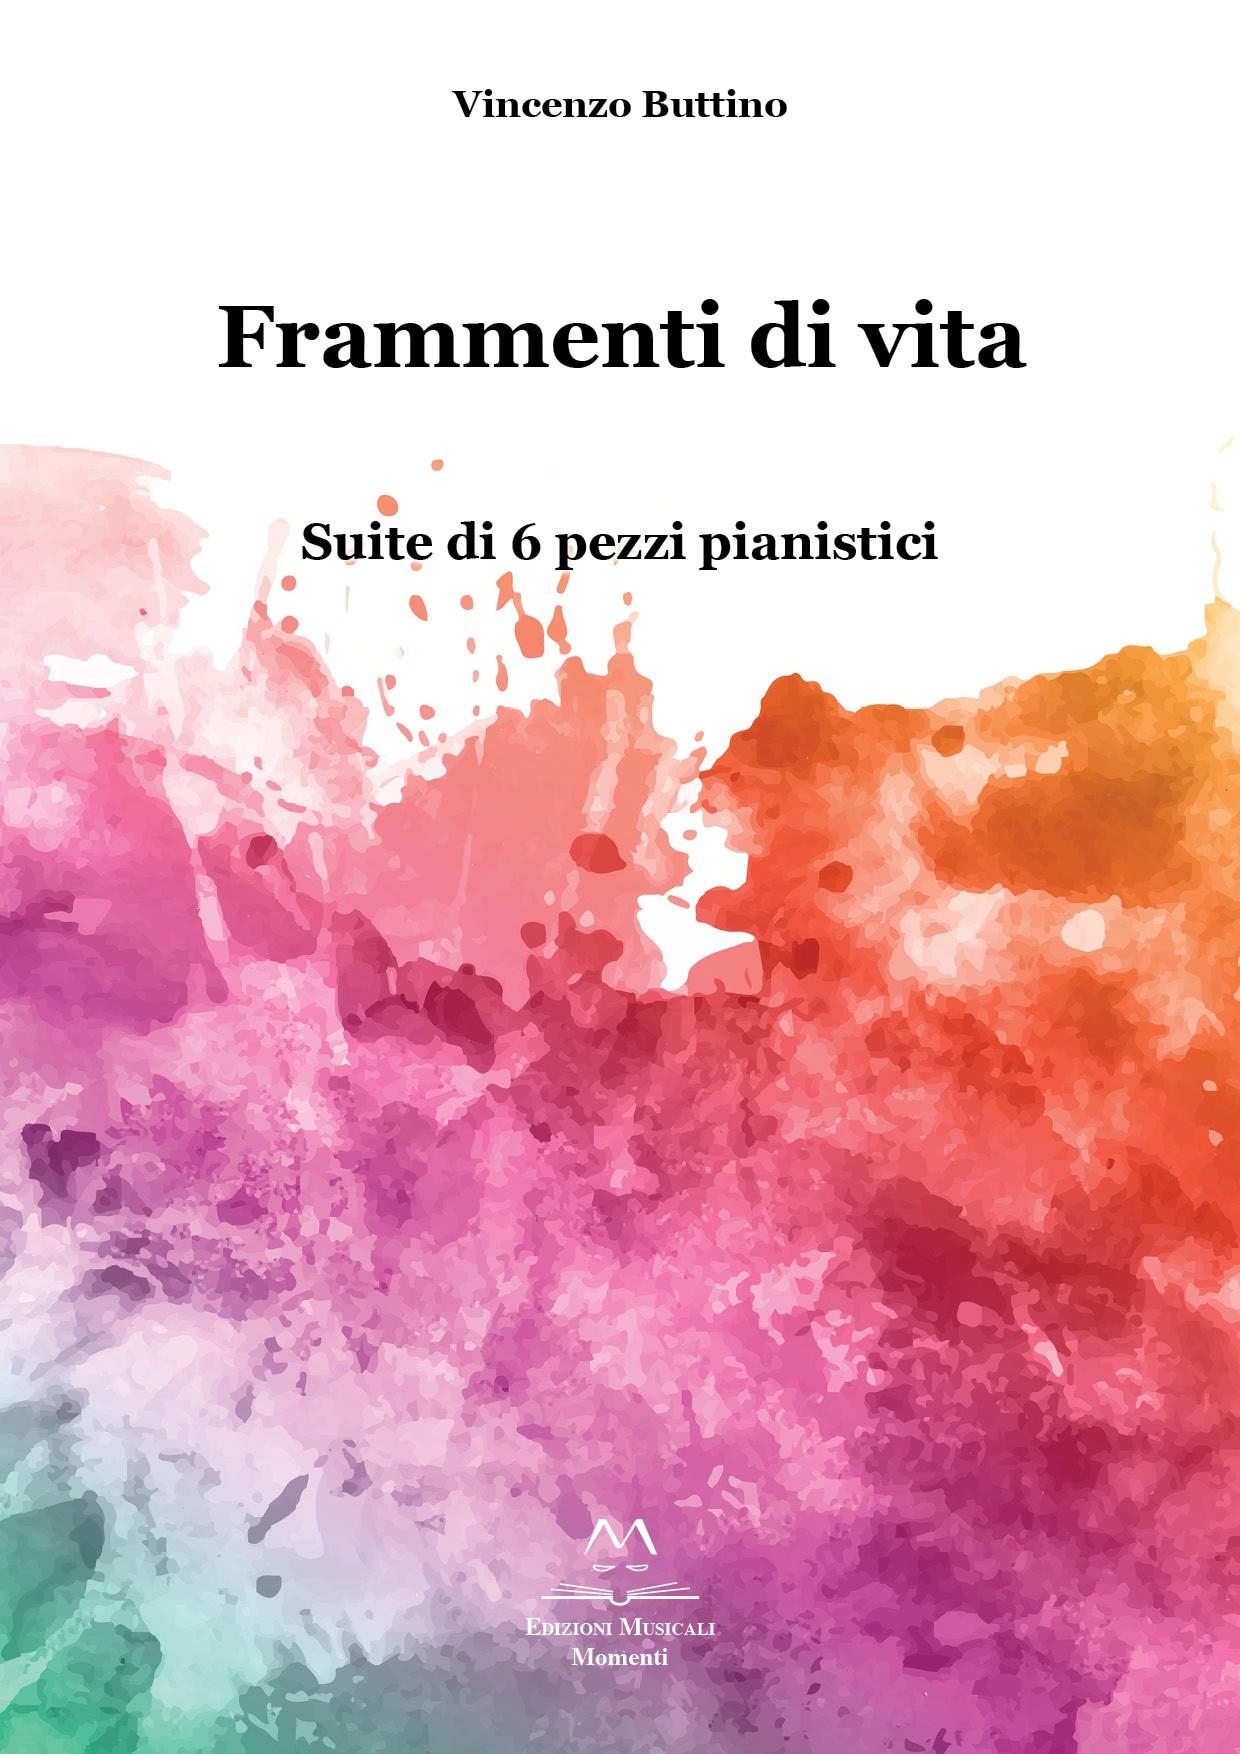 Frammenti di vita di Vincenzo Buttino